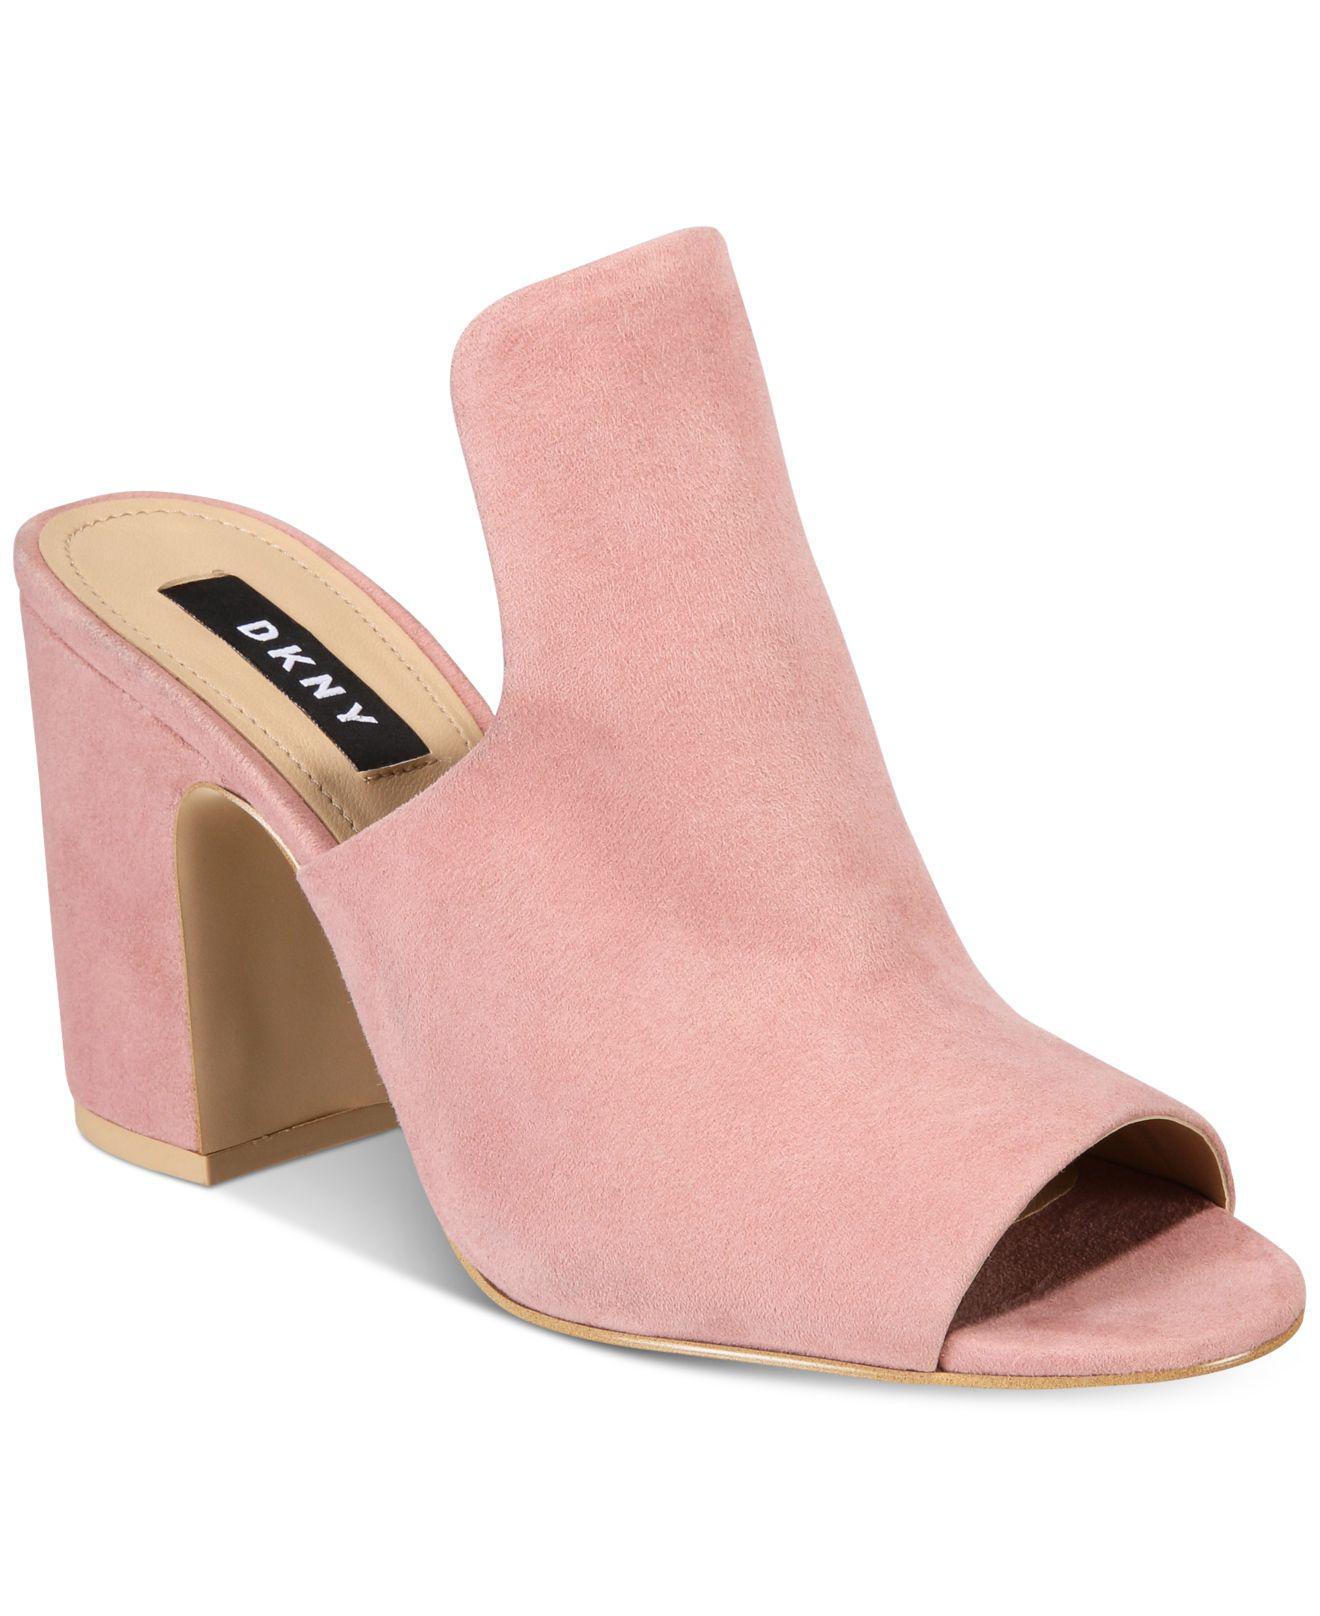 Pre-owned - Leather heels DKNY Ya5oiZ7nW